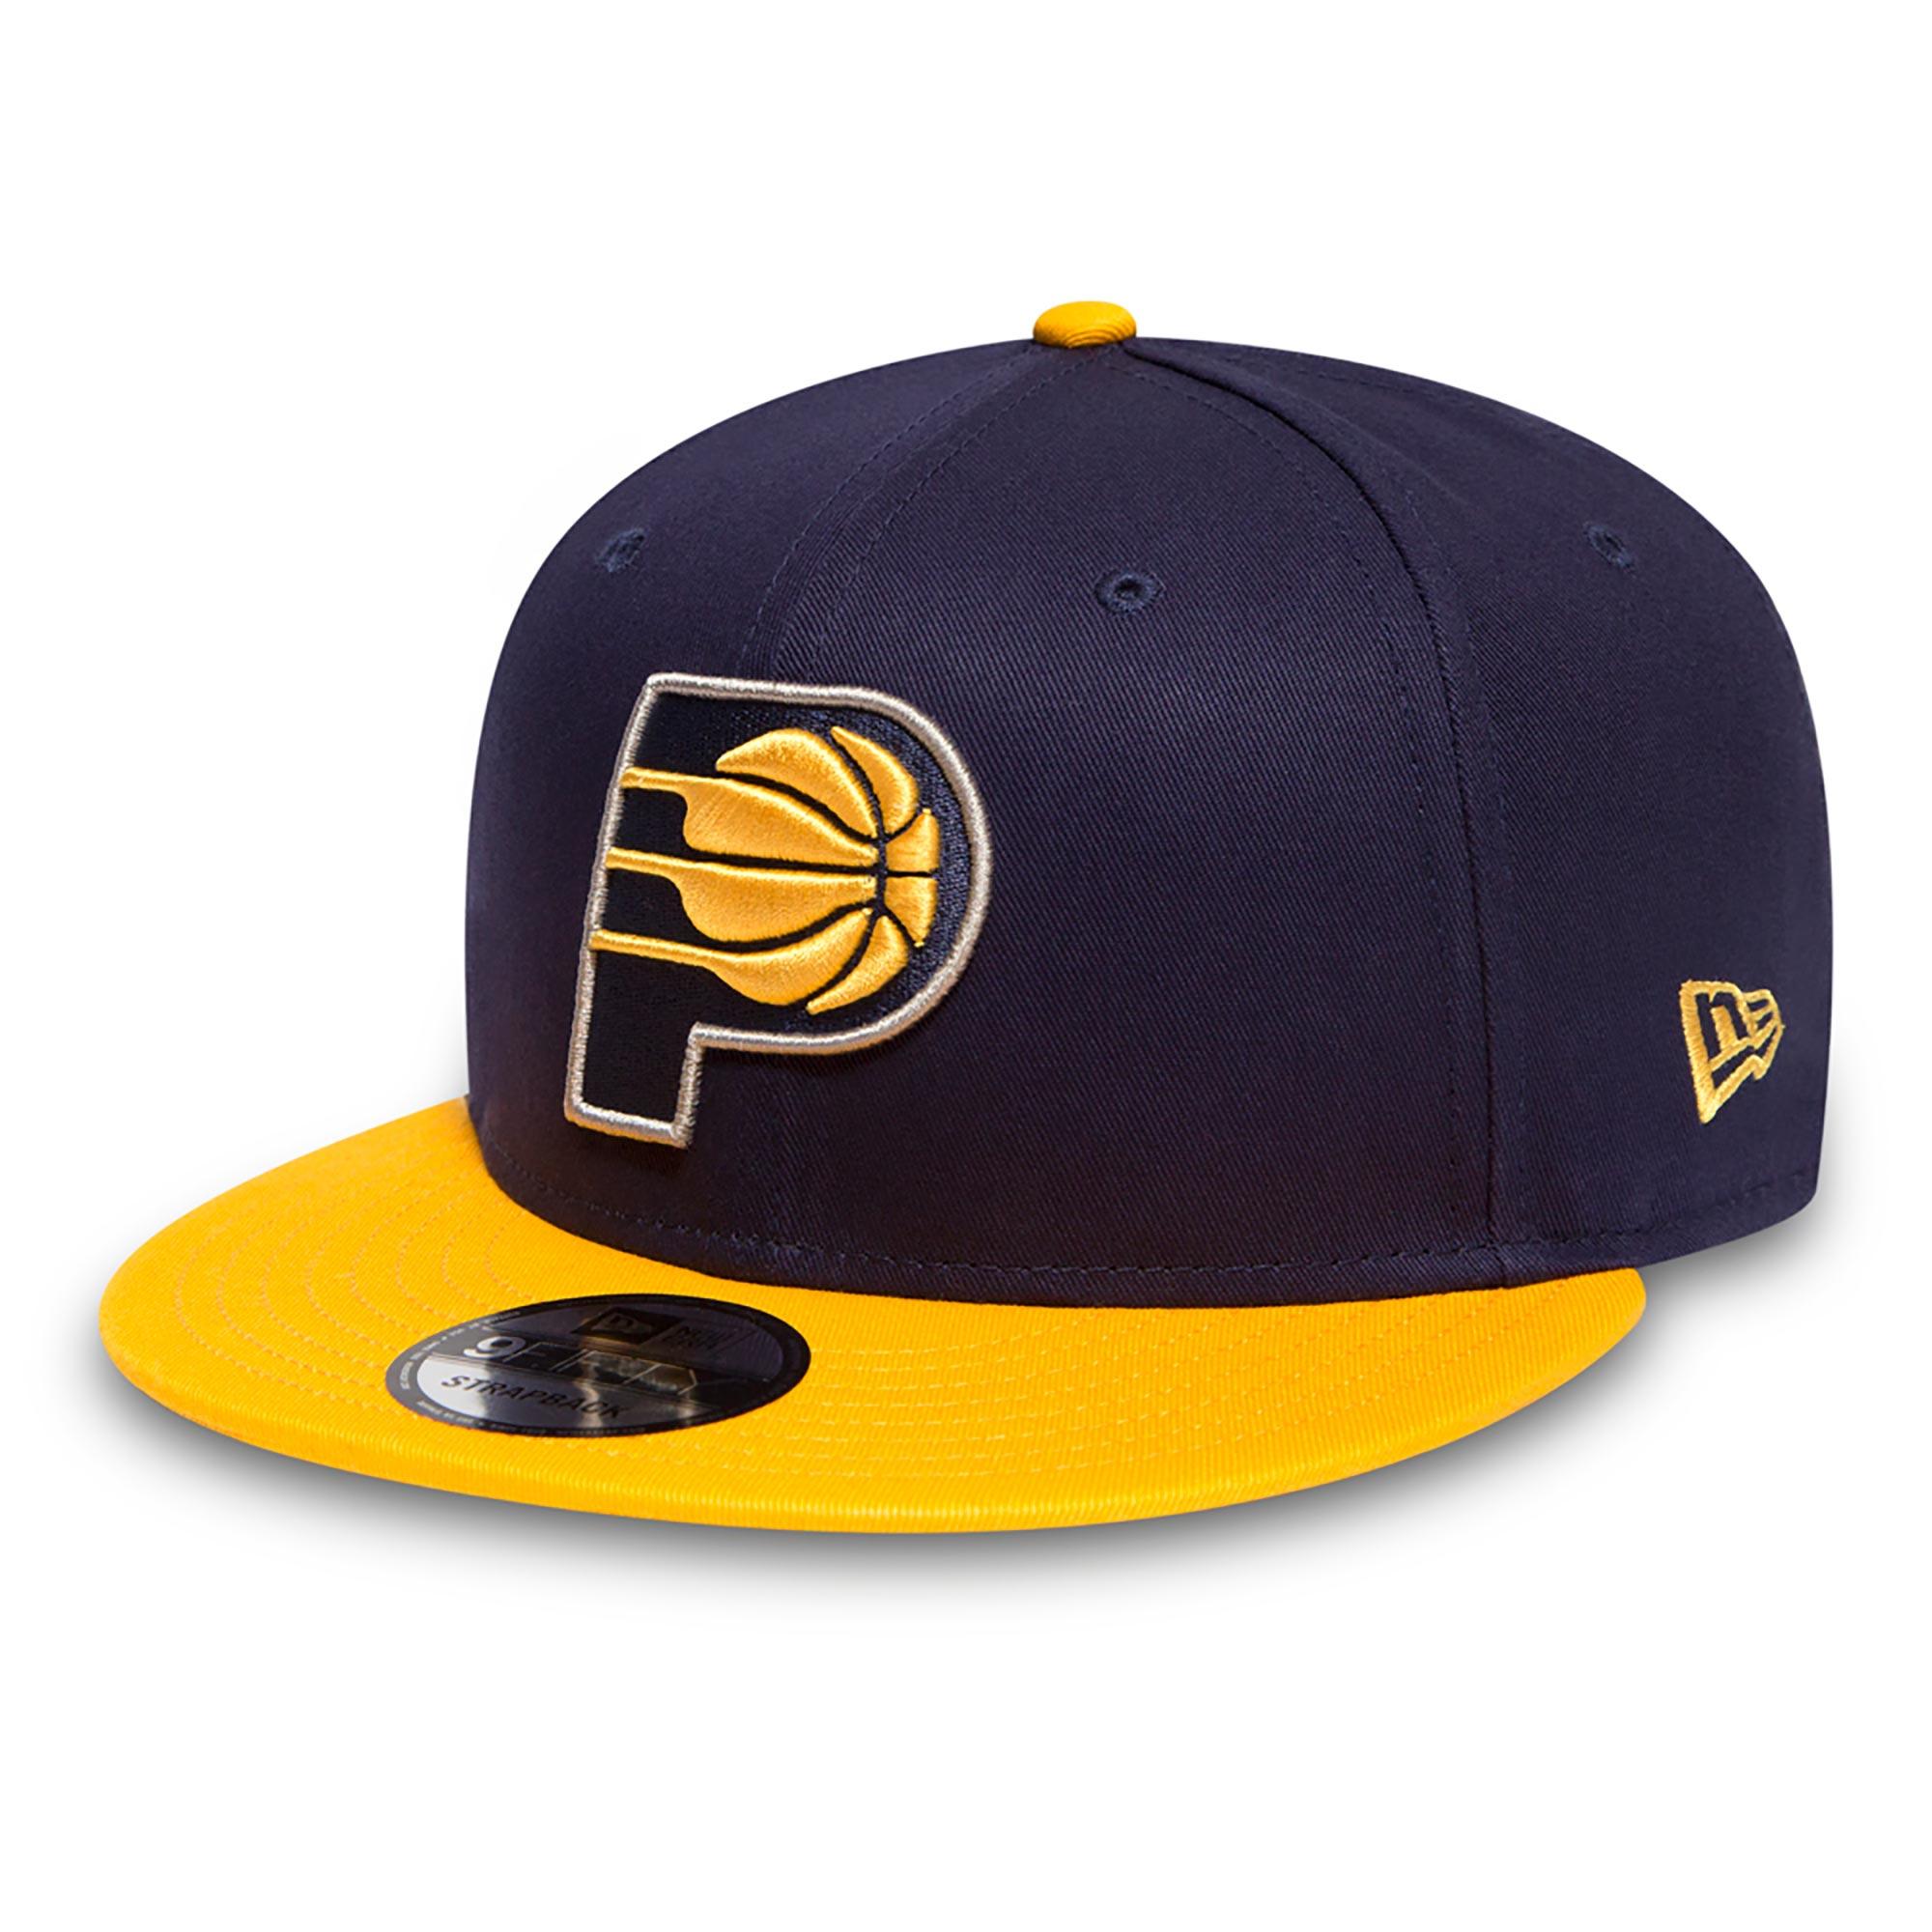 Indiana Pacers New Era Basic 9FIFTY Snapback Cap